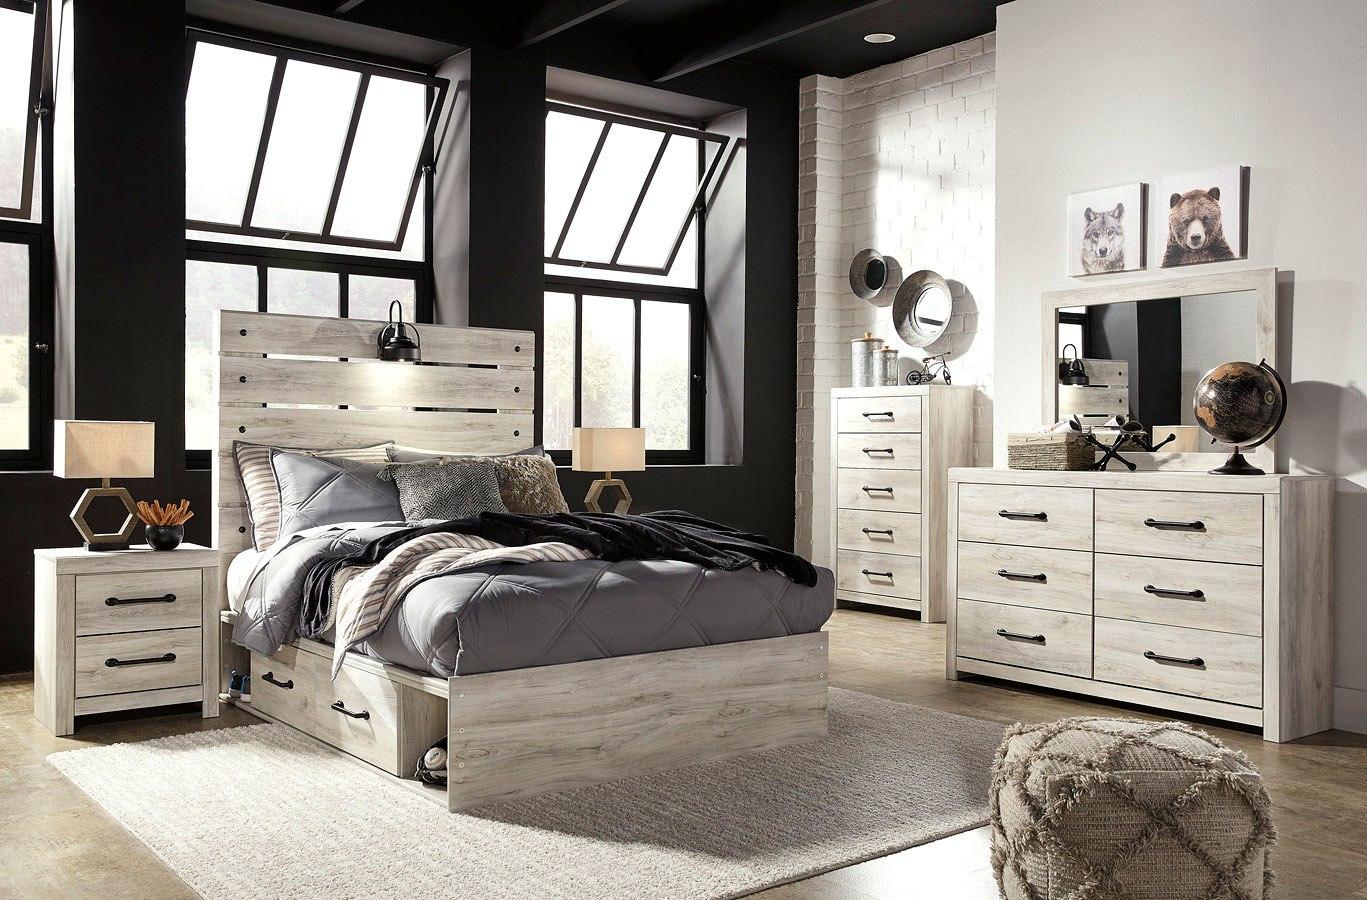 Cambeck Youth Panel Bedroom Set W/ Underbed Storage ...